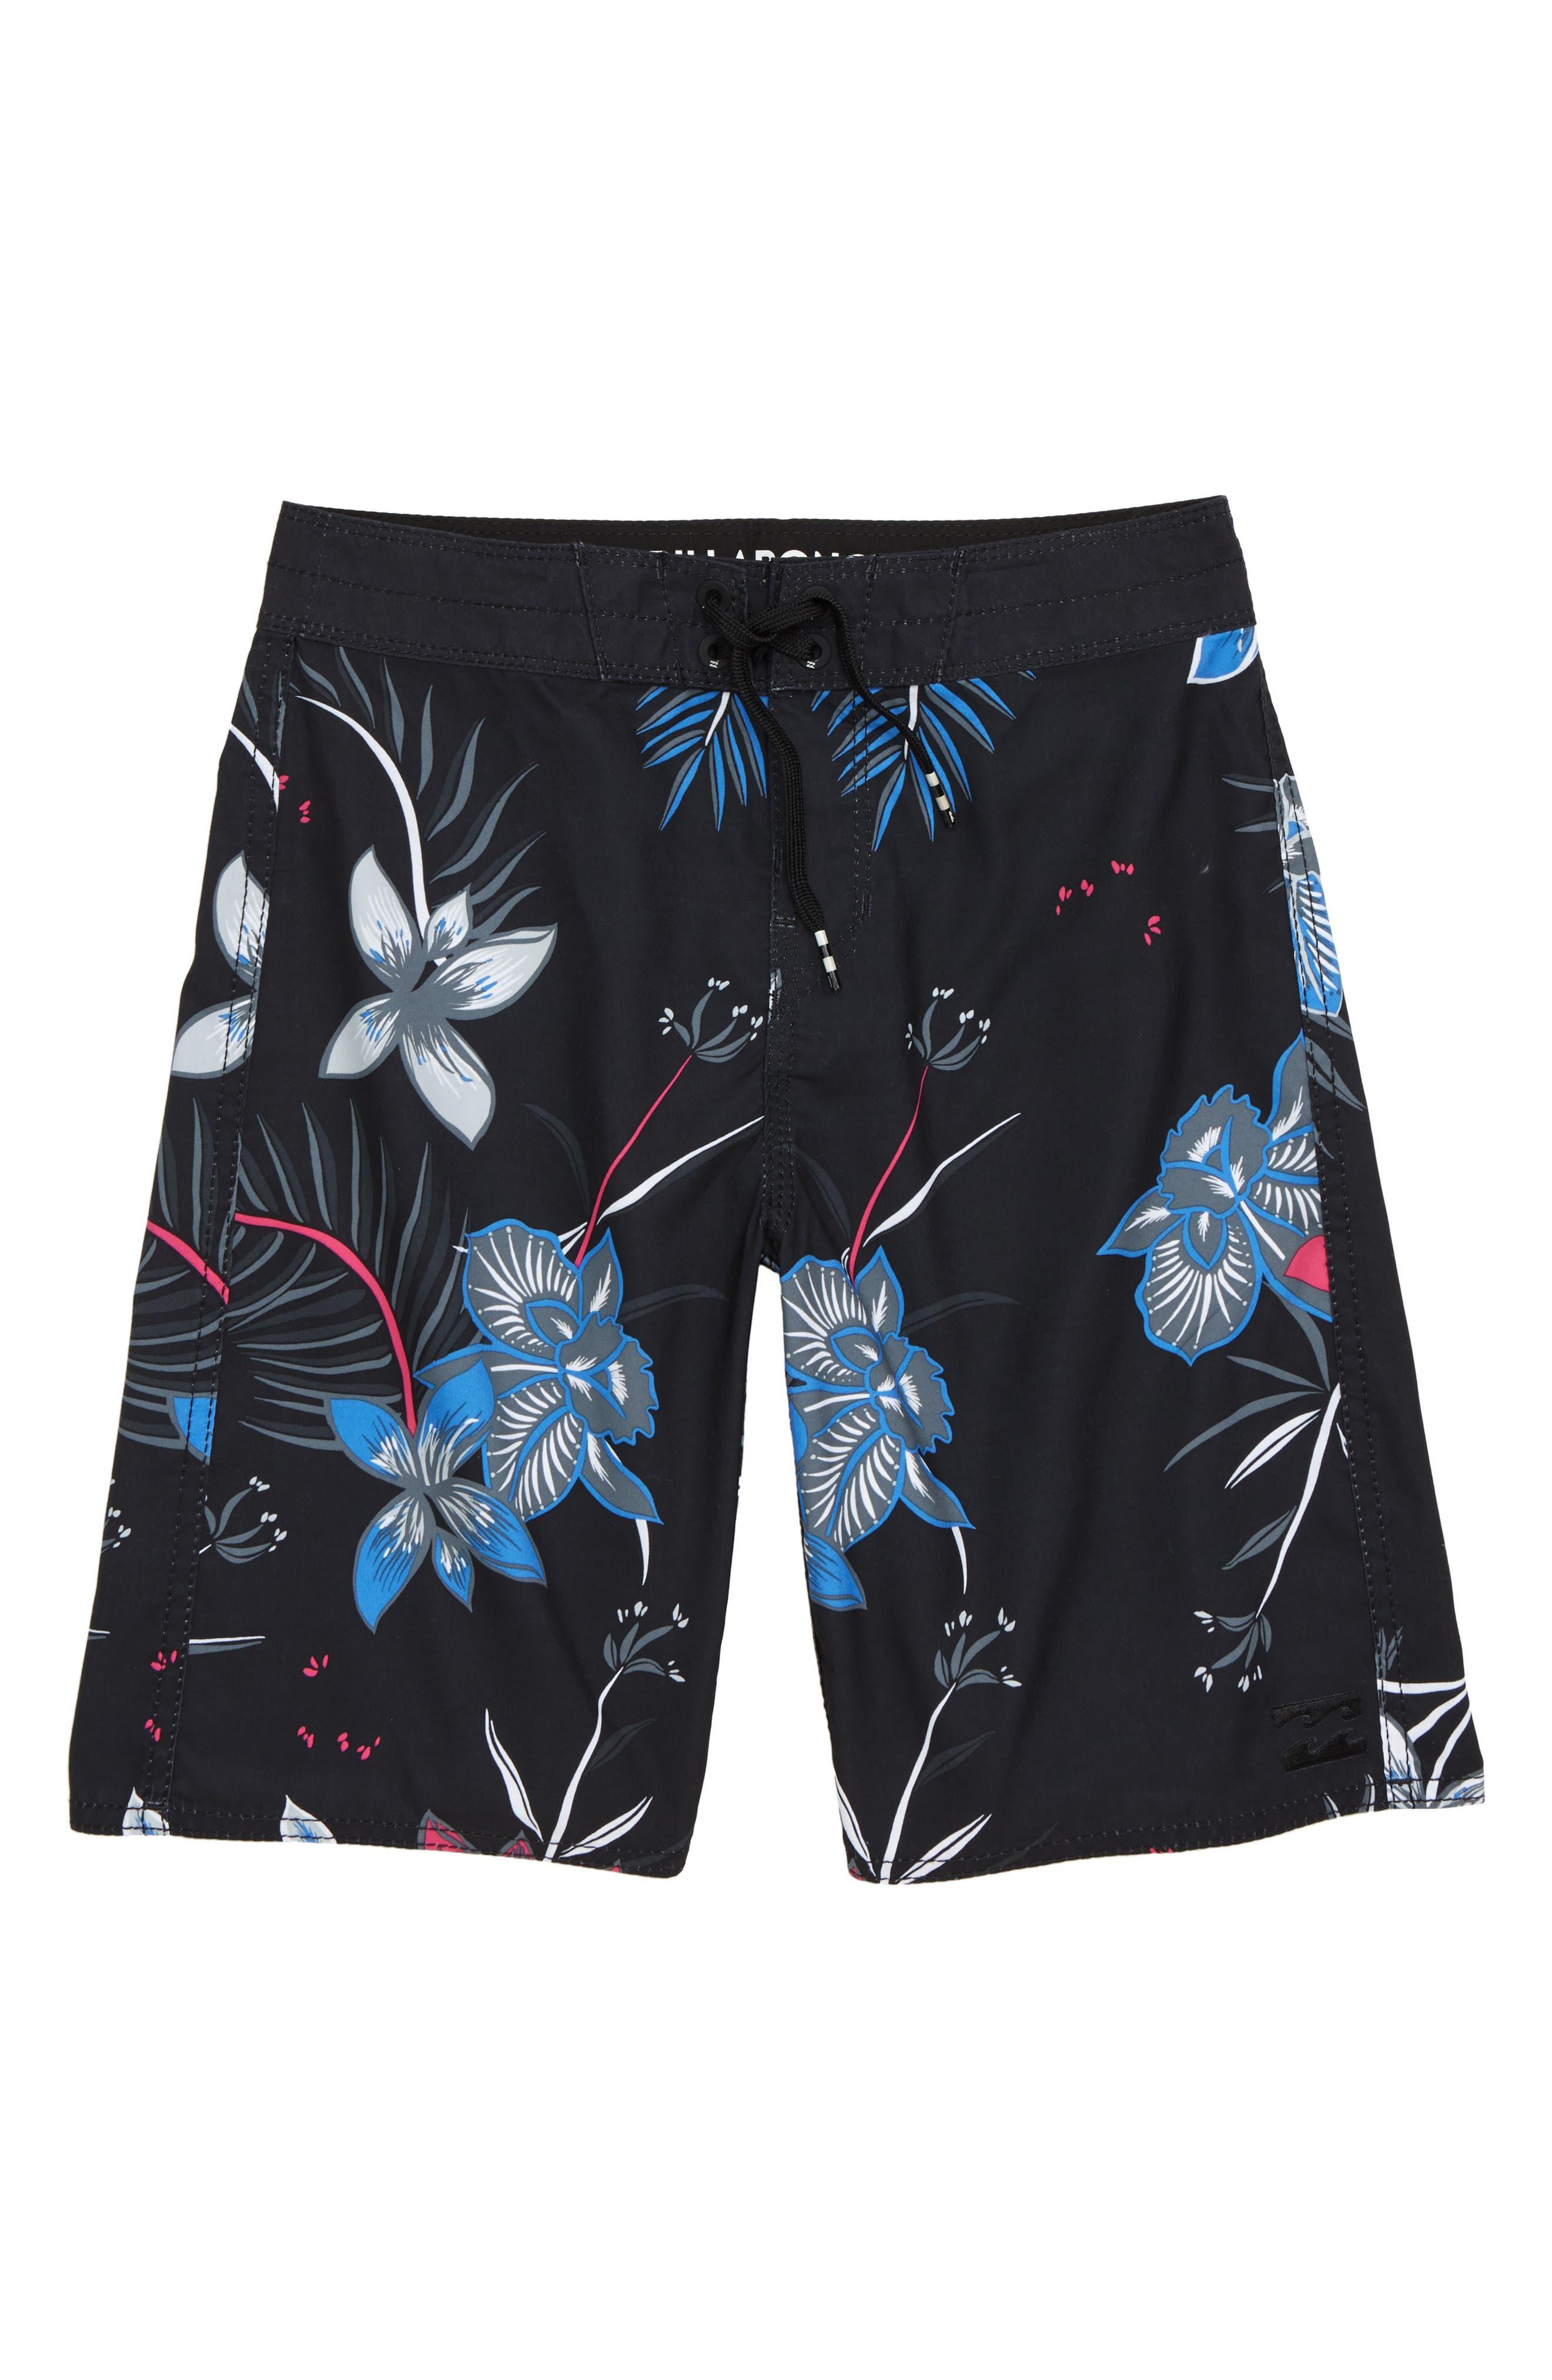 Sundays OG Board Shorts,                             Main thumbnail 1, color,                             Black/ White